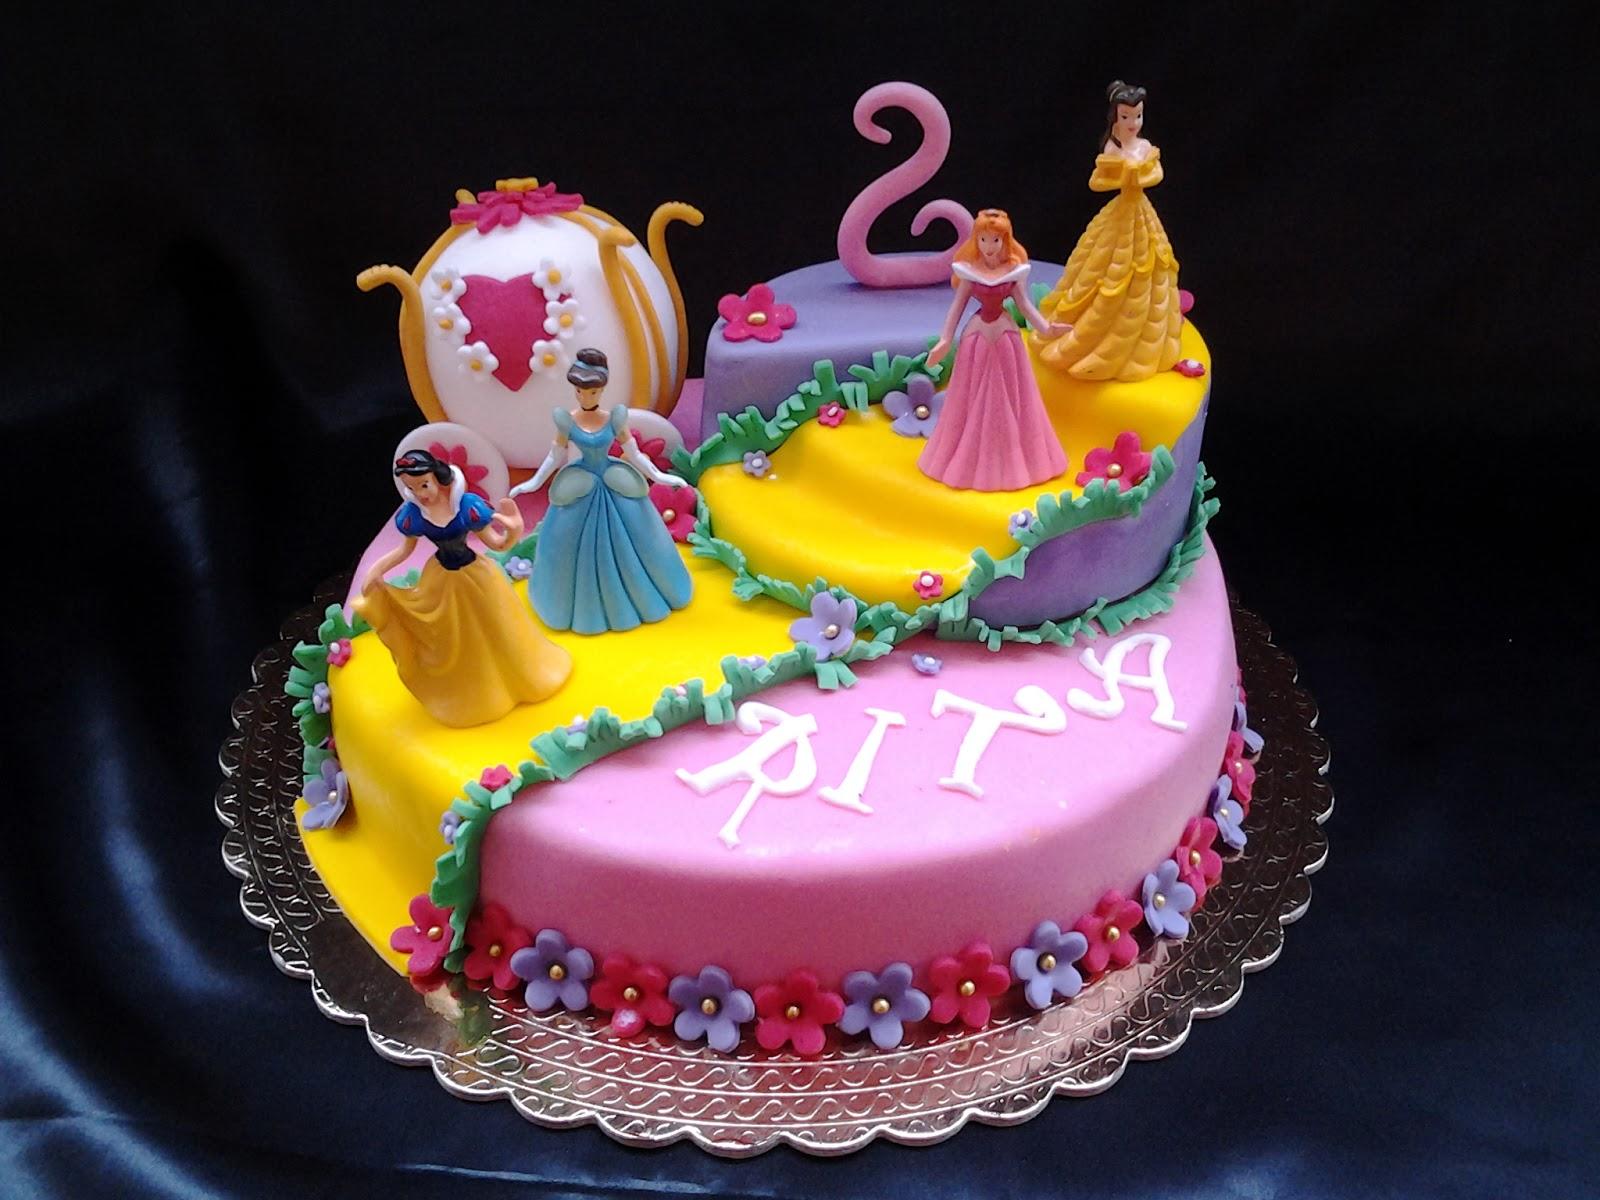 Cake Design Principesse Disney : Sapore di Vaniglia: Torta Principesse Disney